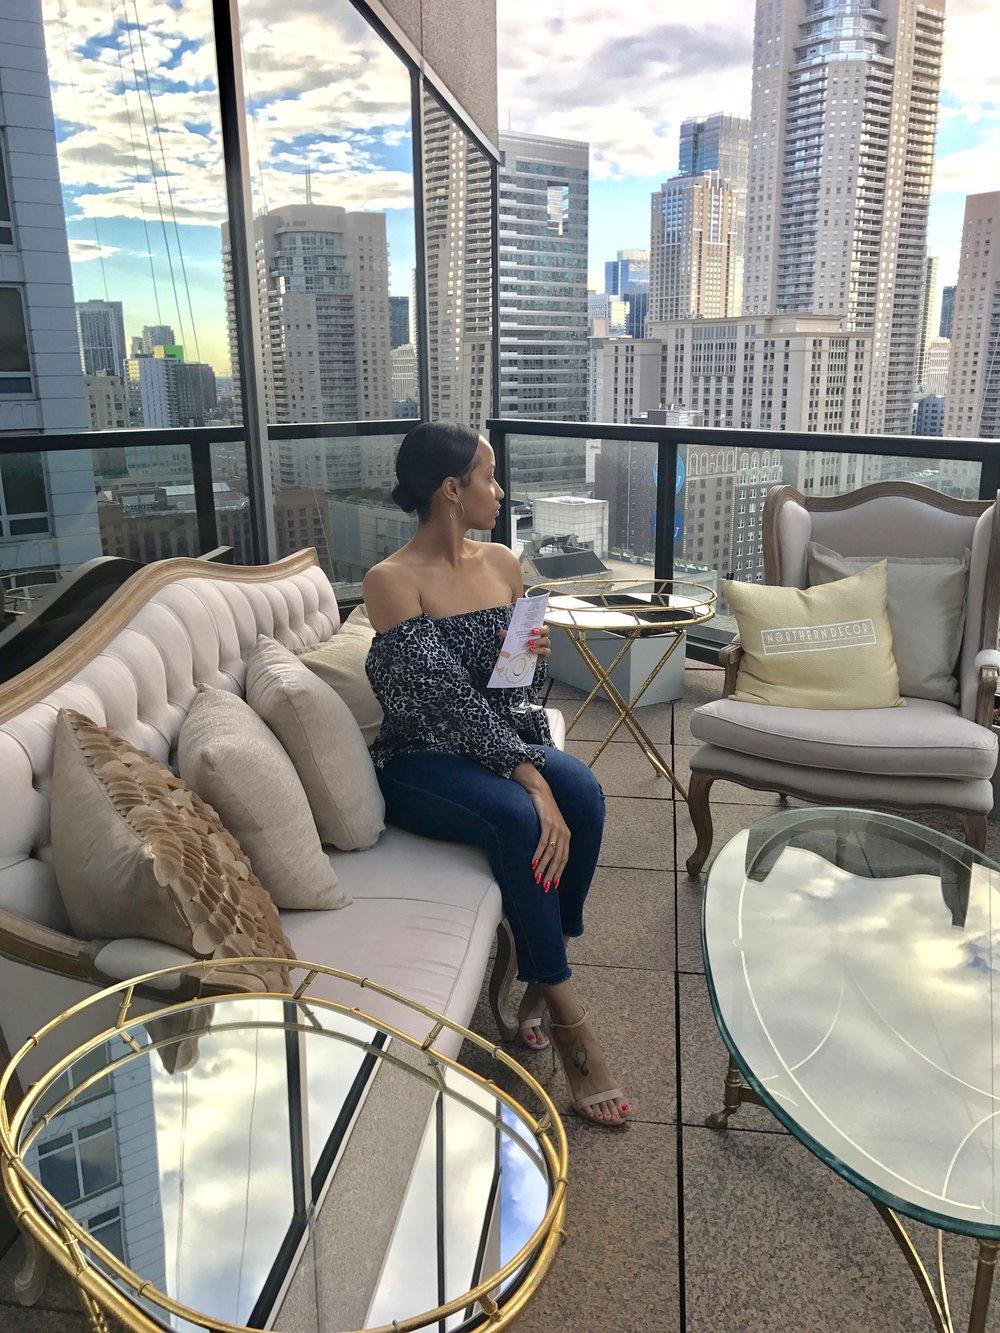 6.26.17 - Modern Luxury Weddings Chicago Issue Release Celebration @ Conrad Chicago